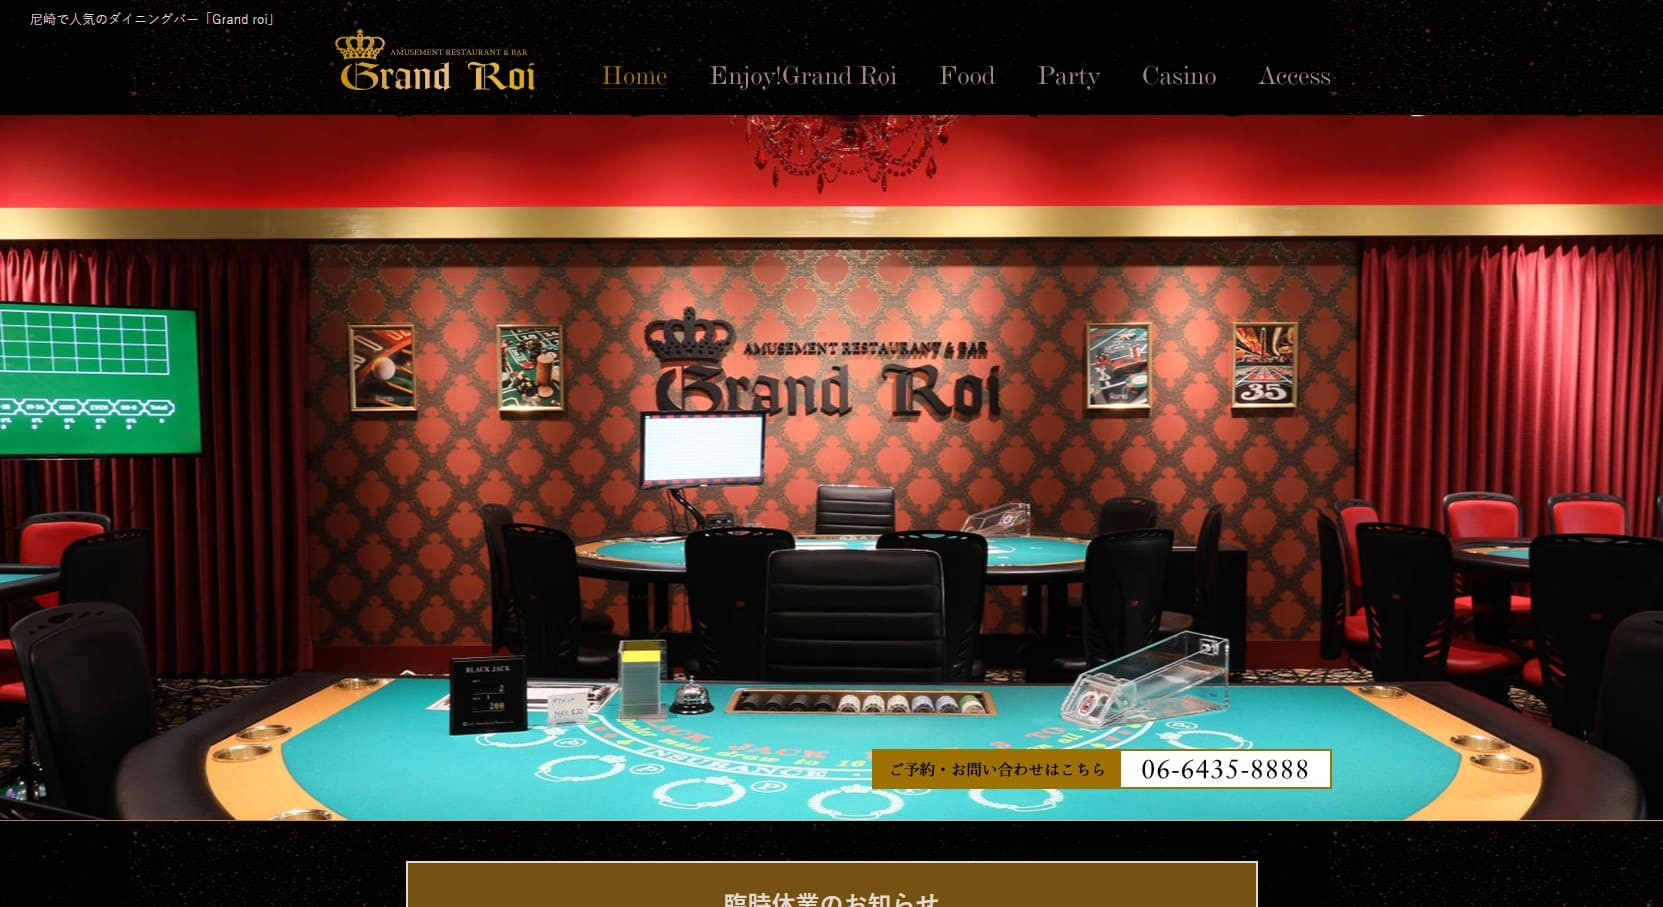 Grand Roiのウェブサイト画像。